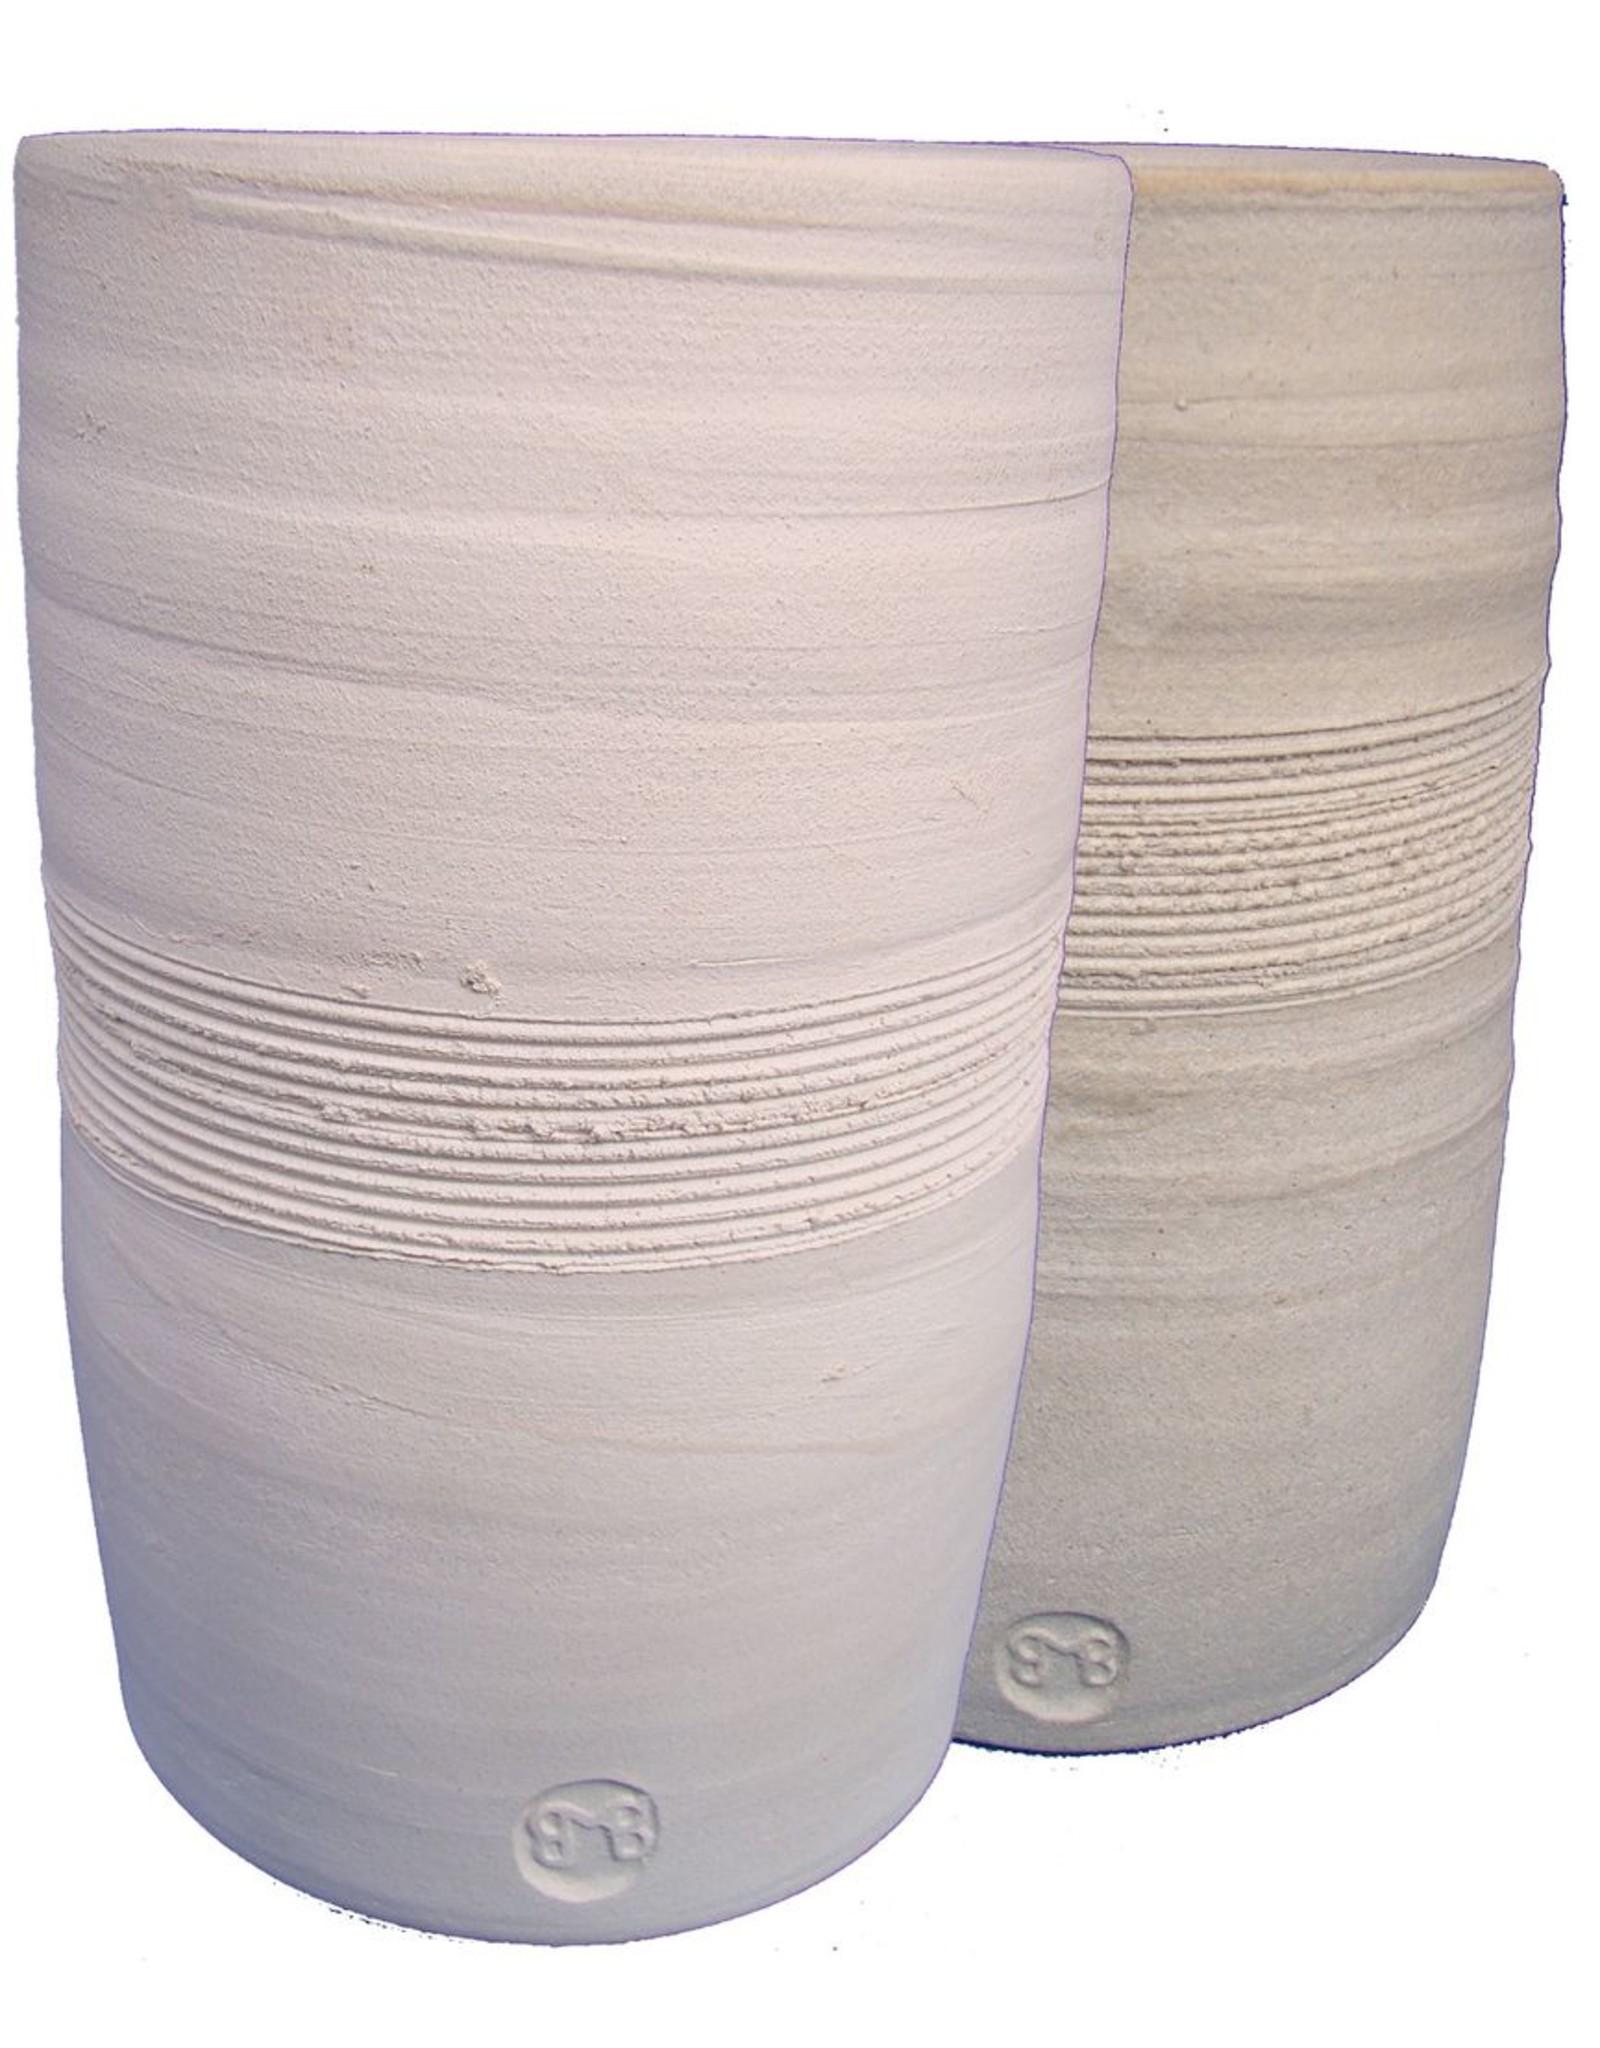 Potclays 1106 White St Thomas (Firing Range 1160˚C-1300˚C) - 12.5kg